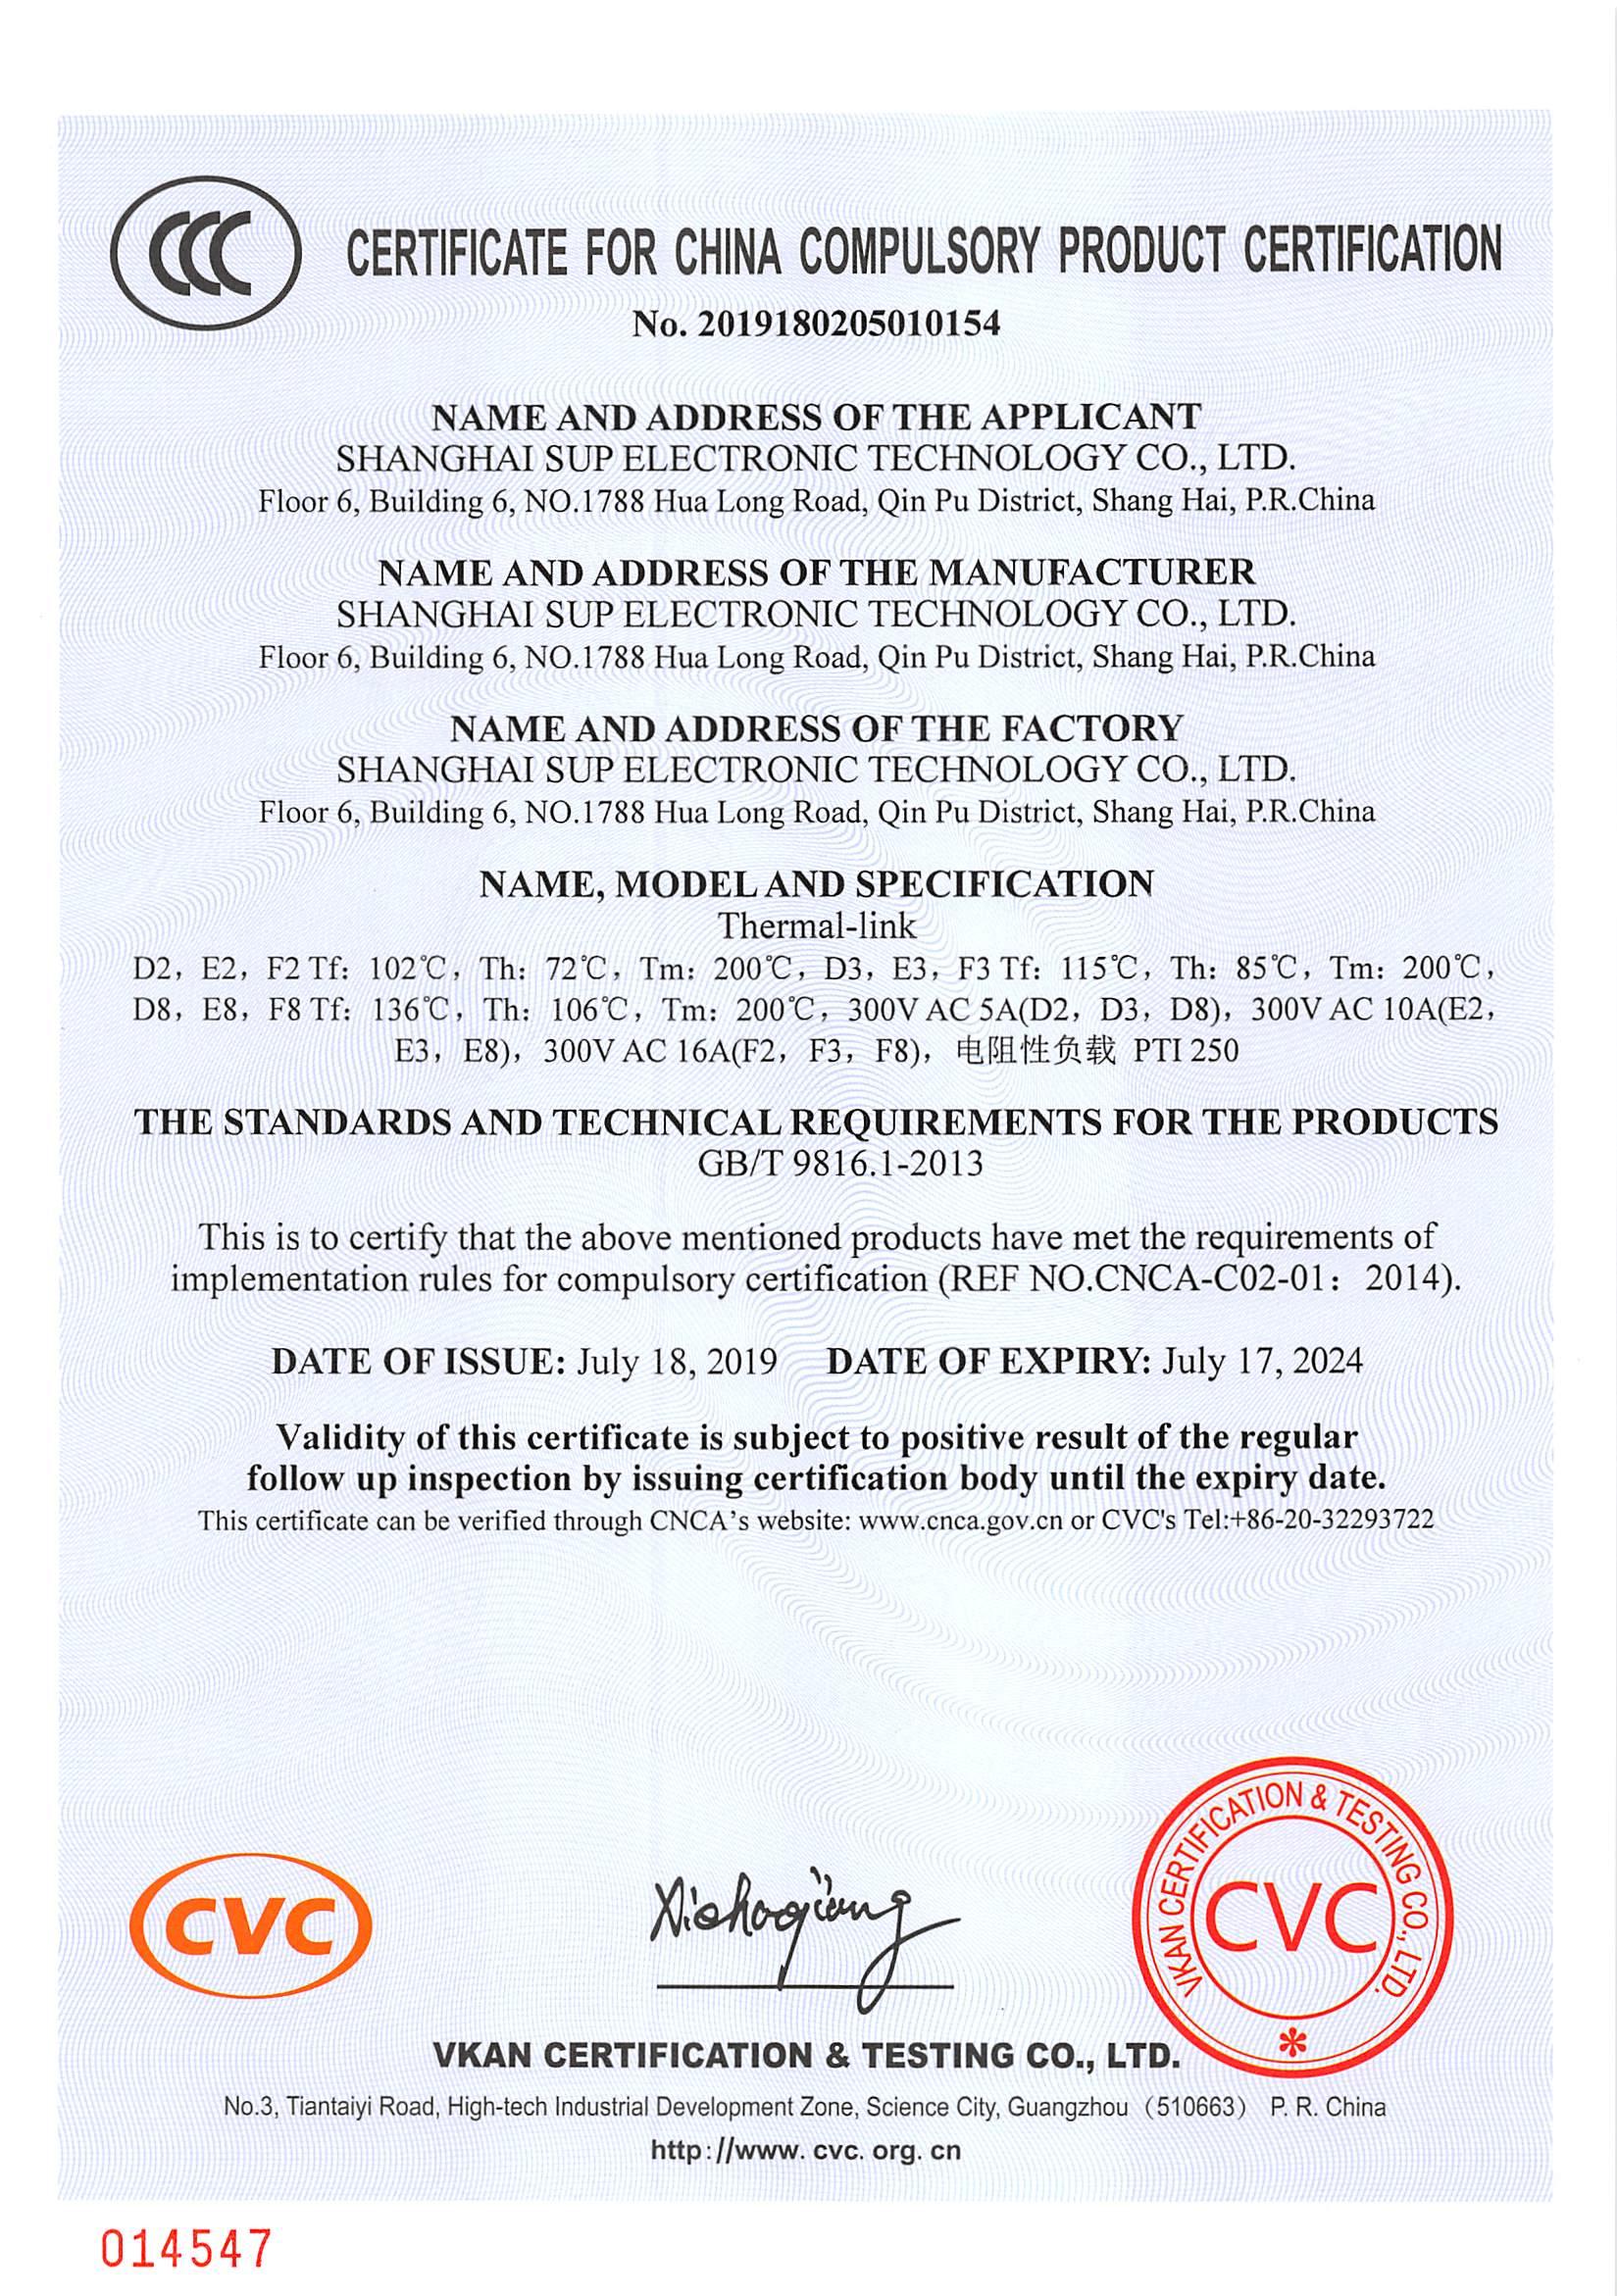 SUPfuse_CCC证书DEF5A10A16A系列2019180205010154_页面_2